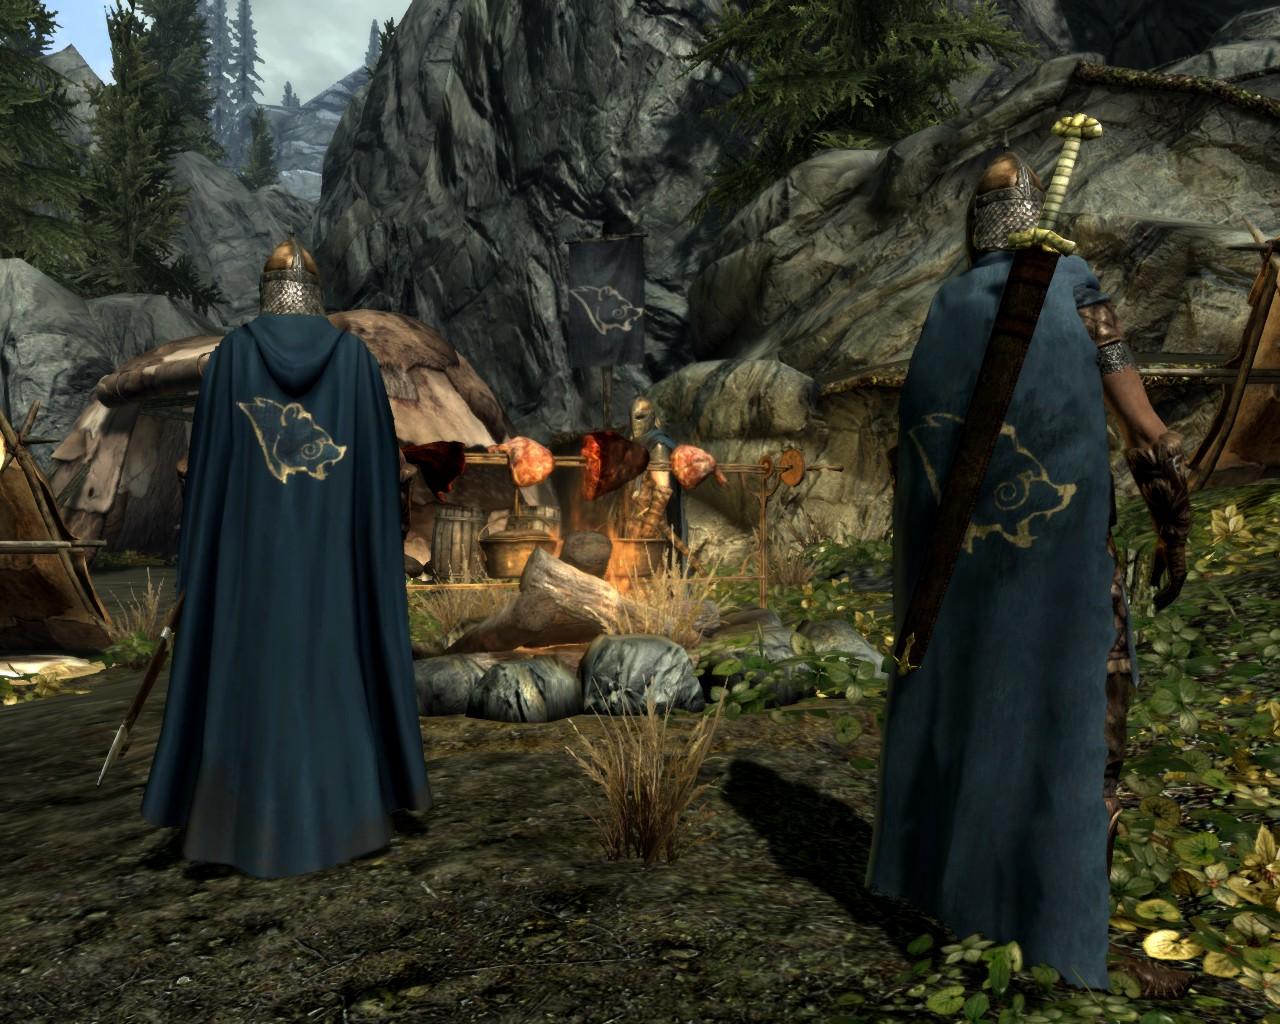 Cloaks Of Skyrim The Elder Scrolls Mods Wiki Fandom Powered By Wikia